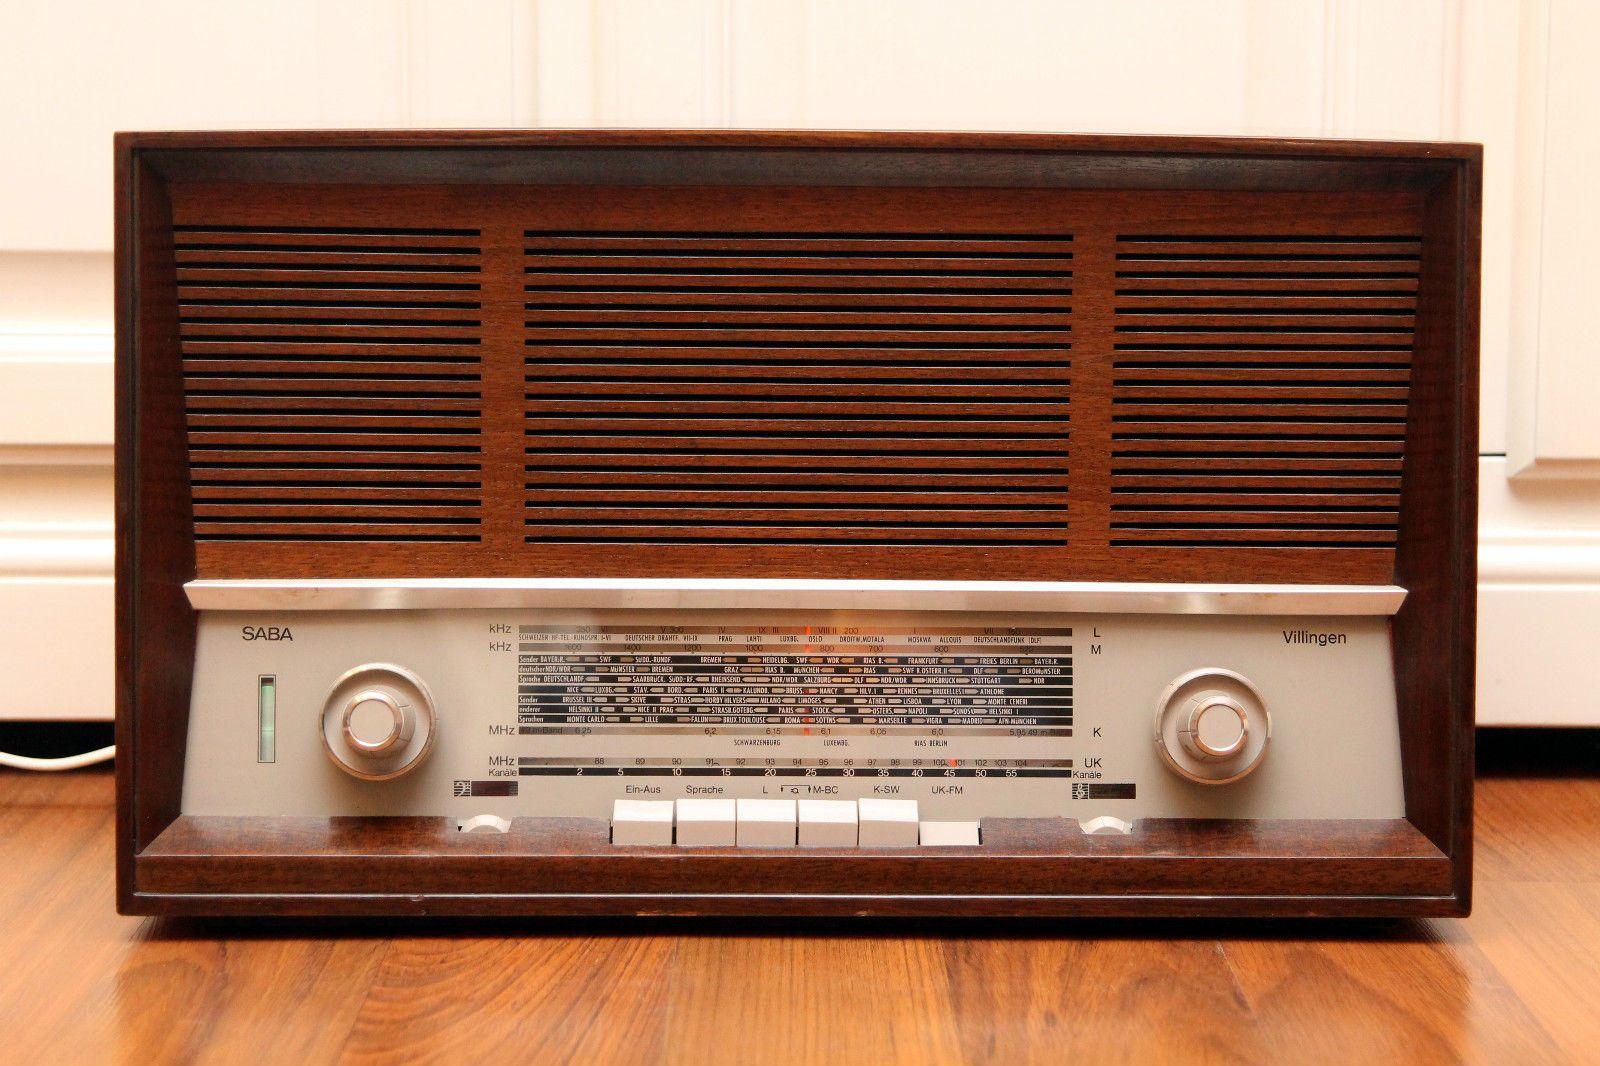 Restored Rarity Saba Villingen 16 Vintage Tube Radio Top Germany Amplifier Tun Radio Vintage Radio Vintage